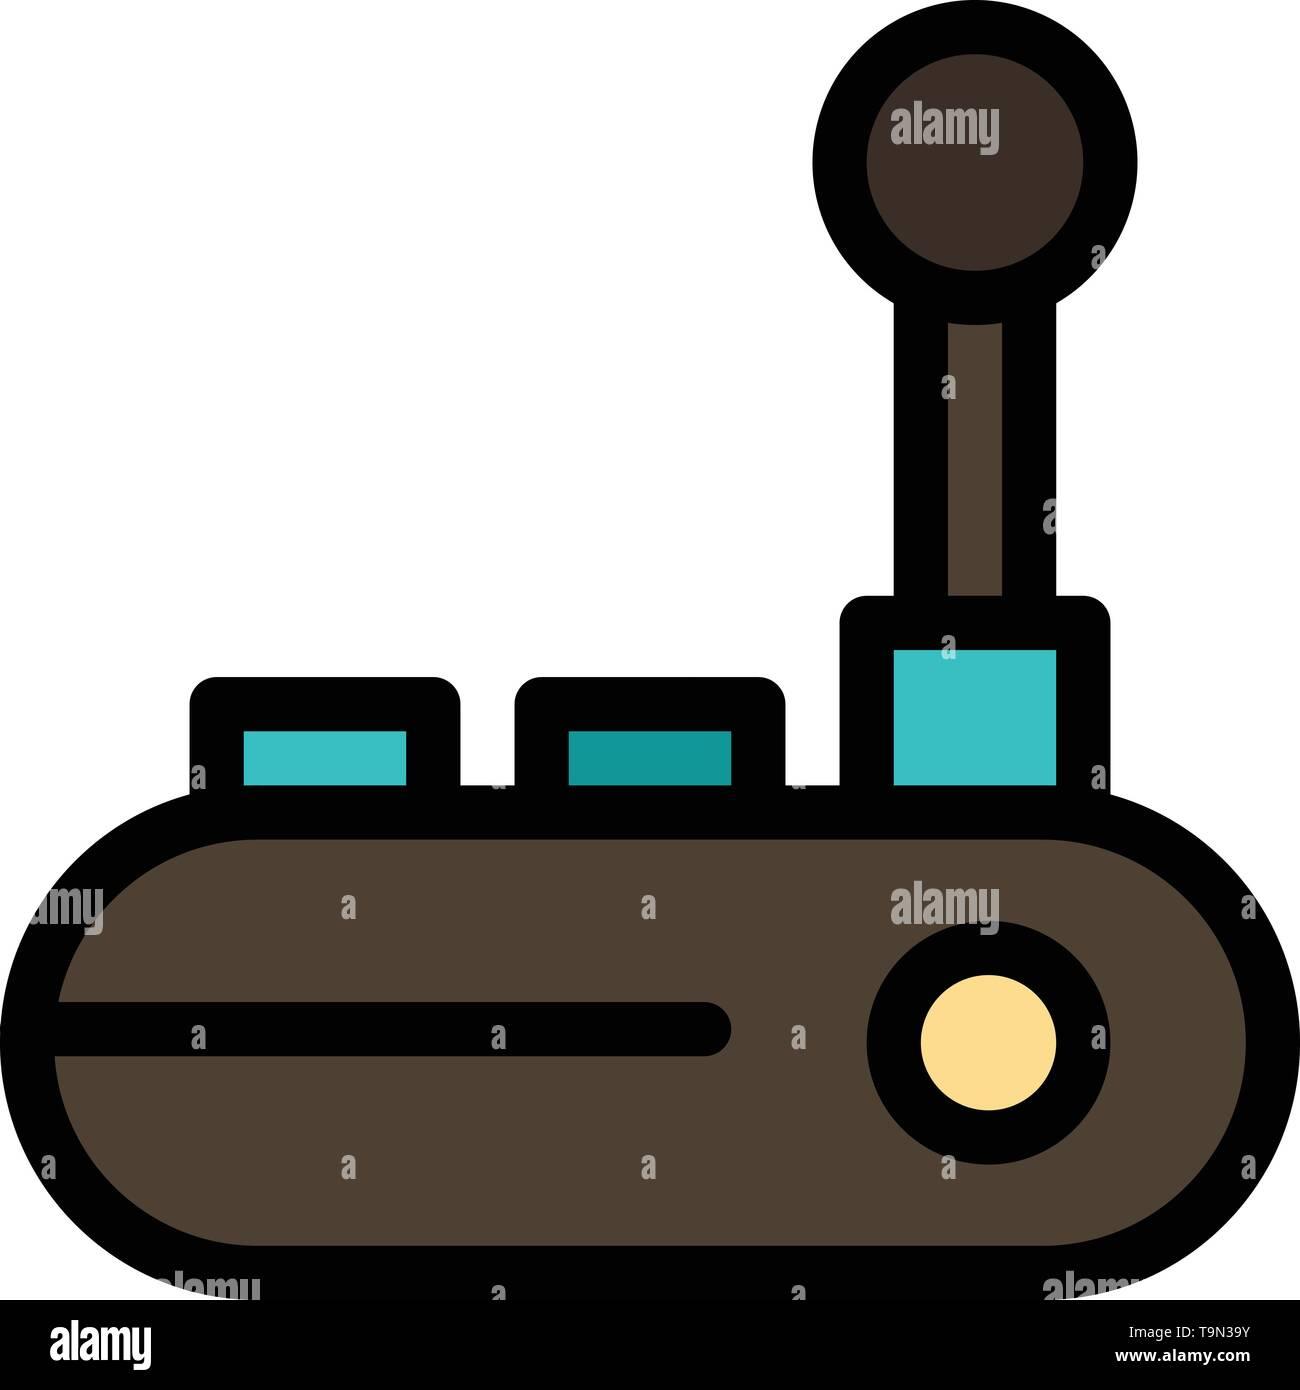 Controller, Joy Pad, Joy Stick, Joy pad  Flat Color Icon. Vector icon banner Template - Stock Image